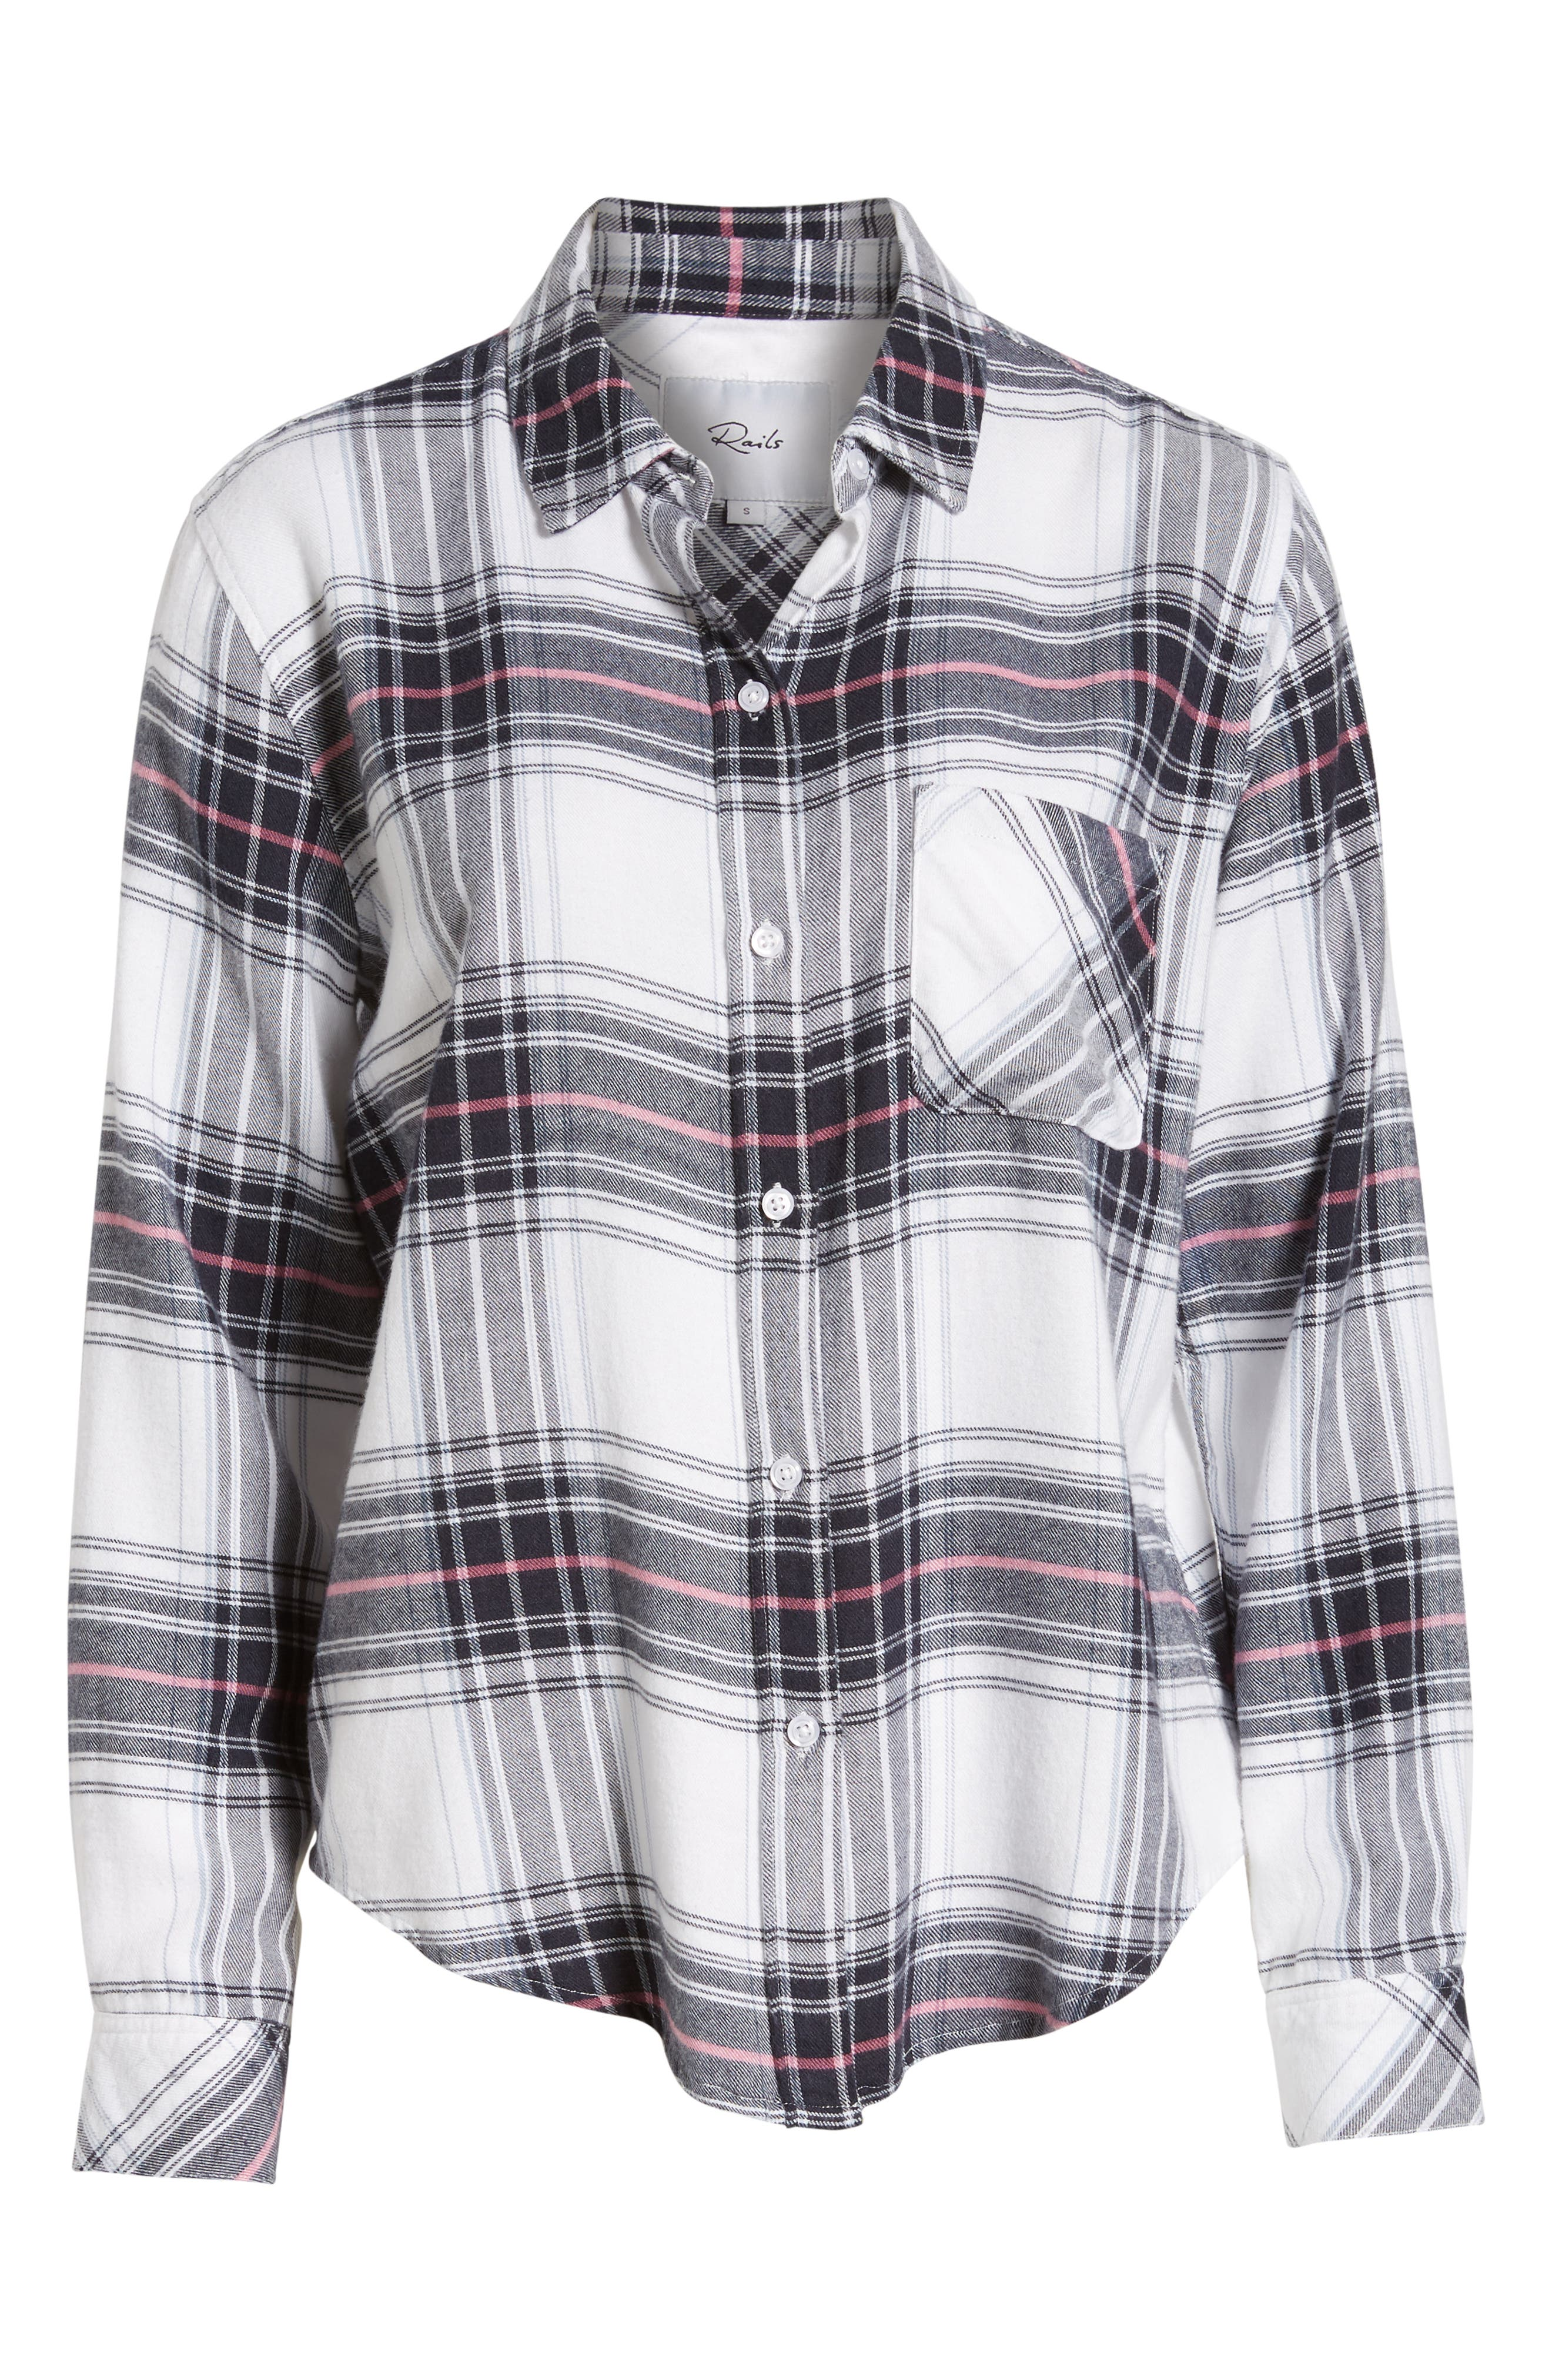 Milo Plaid Shirt,                             Alternate thumbnail 6, color,                             WHITE NAVY MAGENTA